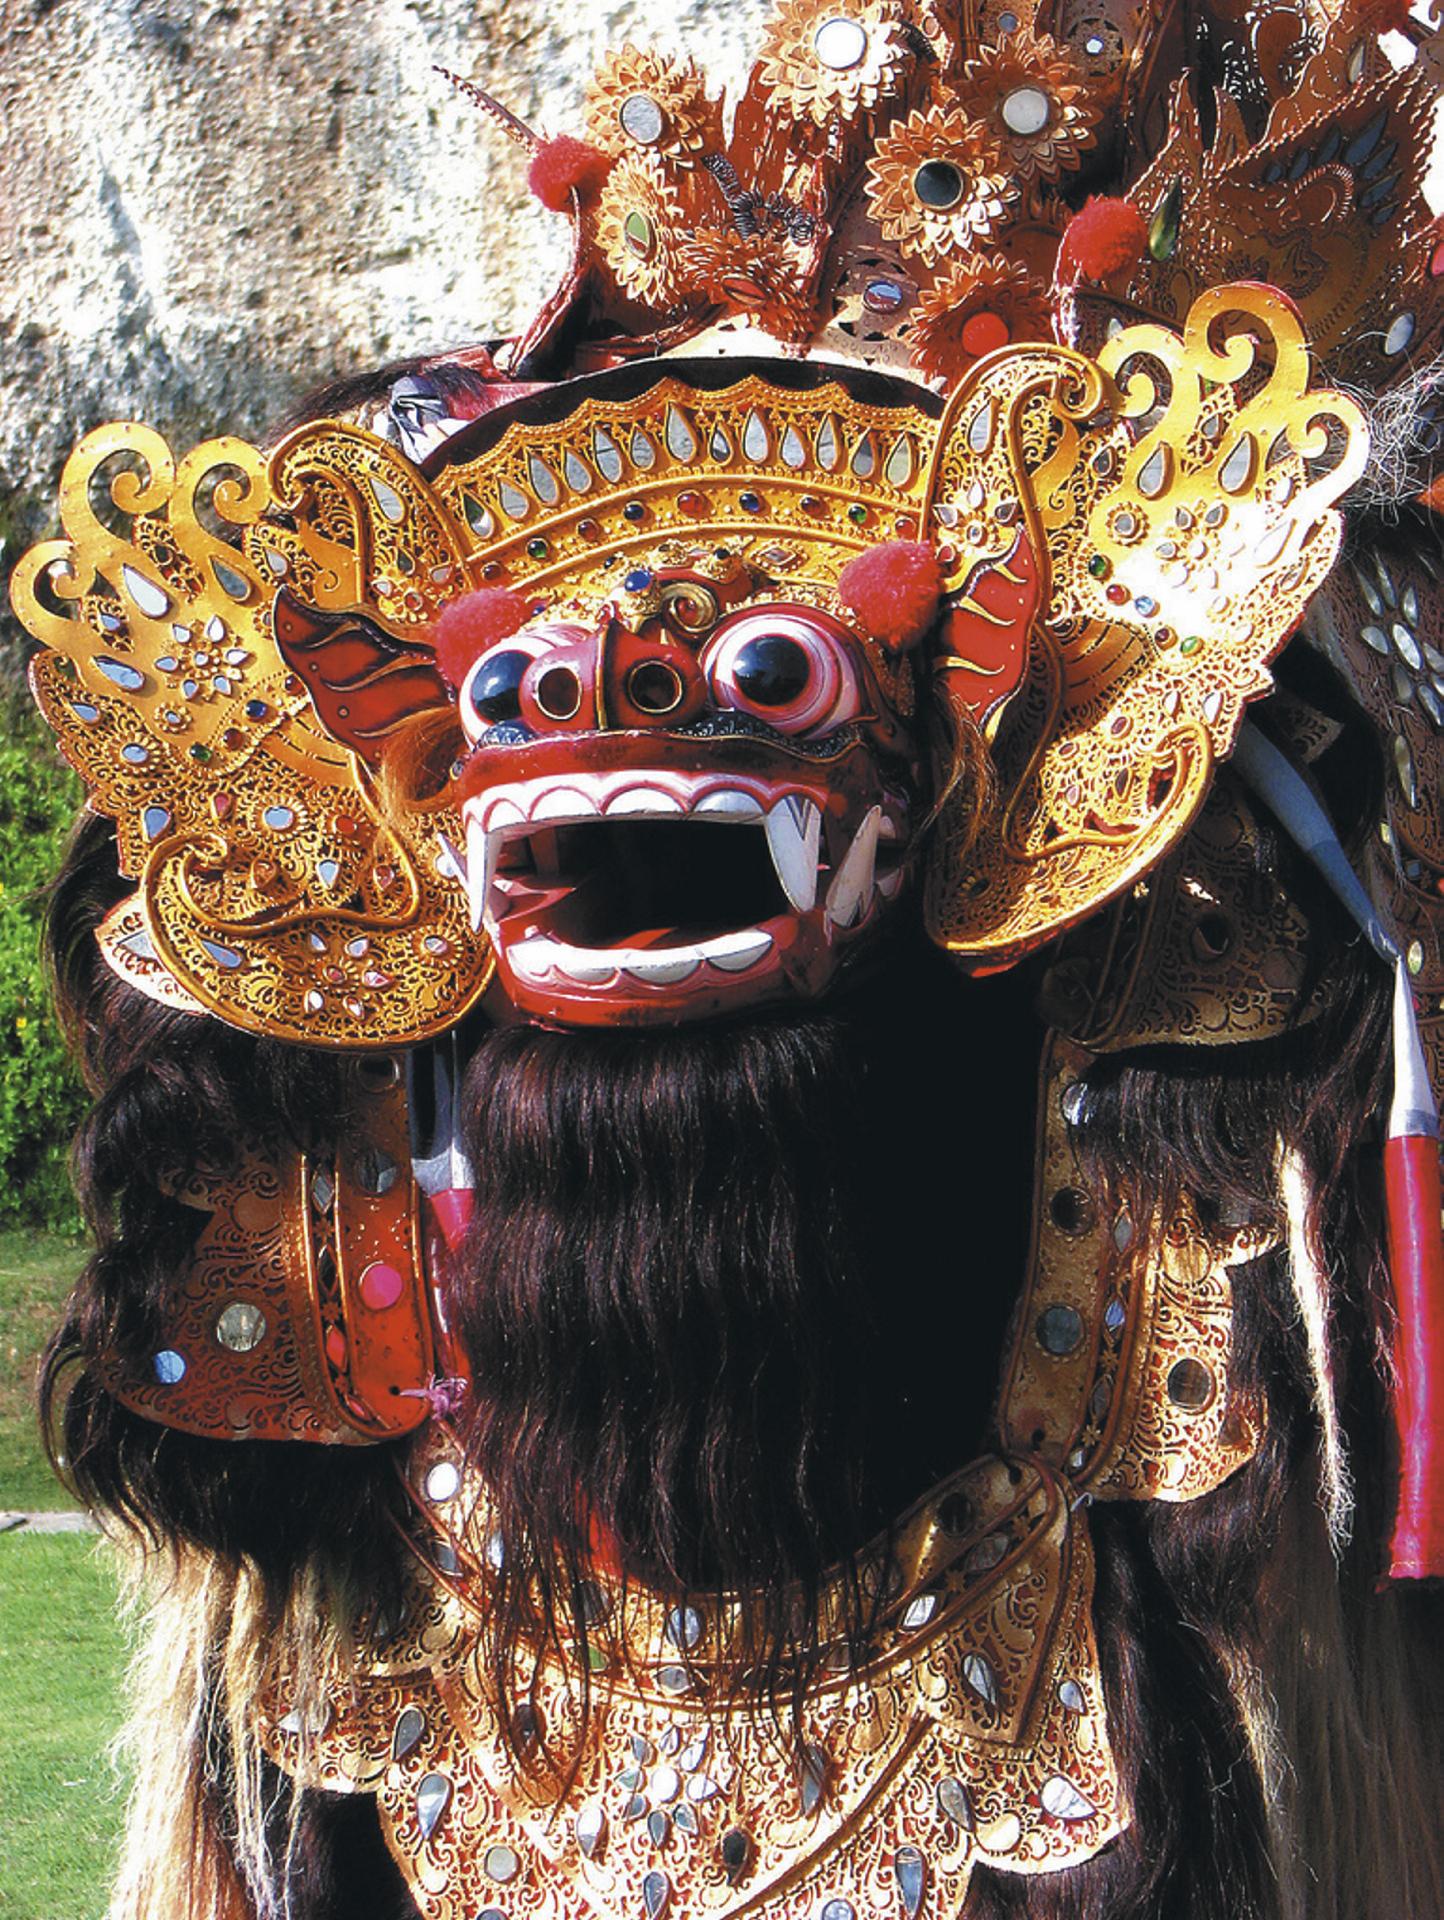 Löwenmaske des Barong-Tanzes